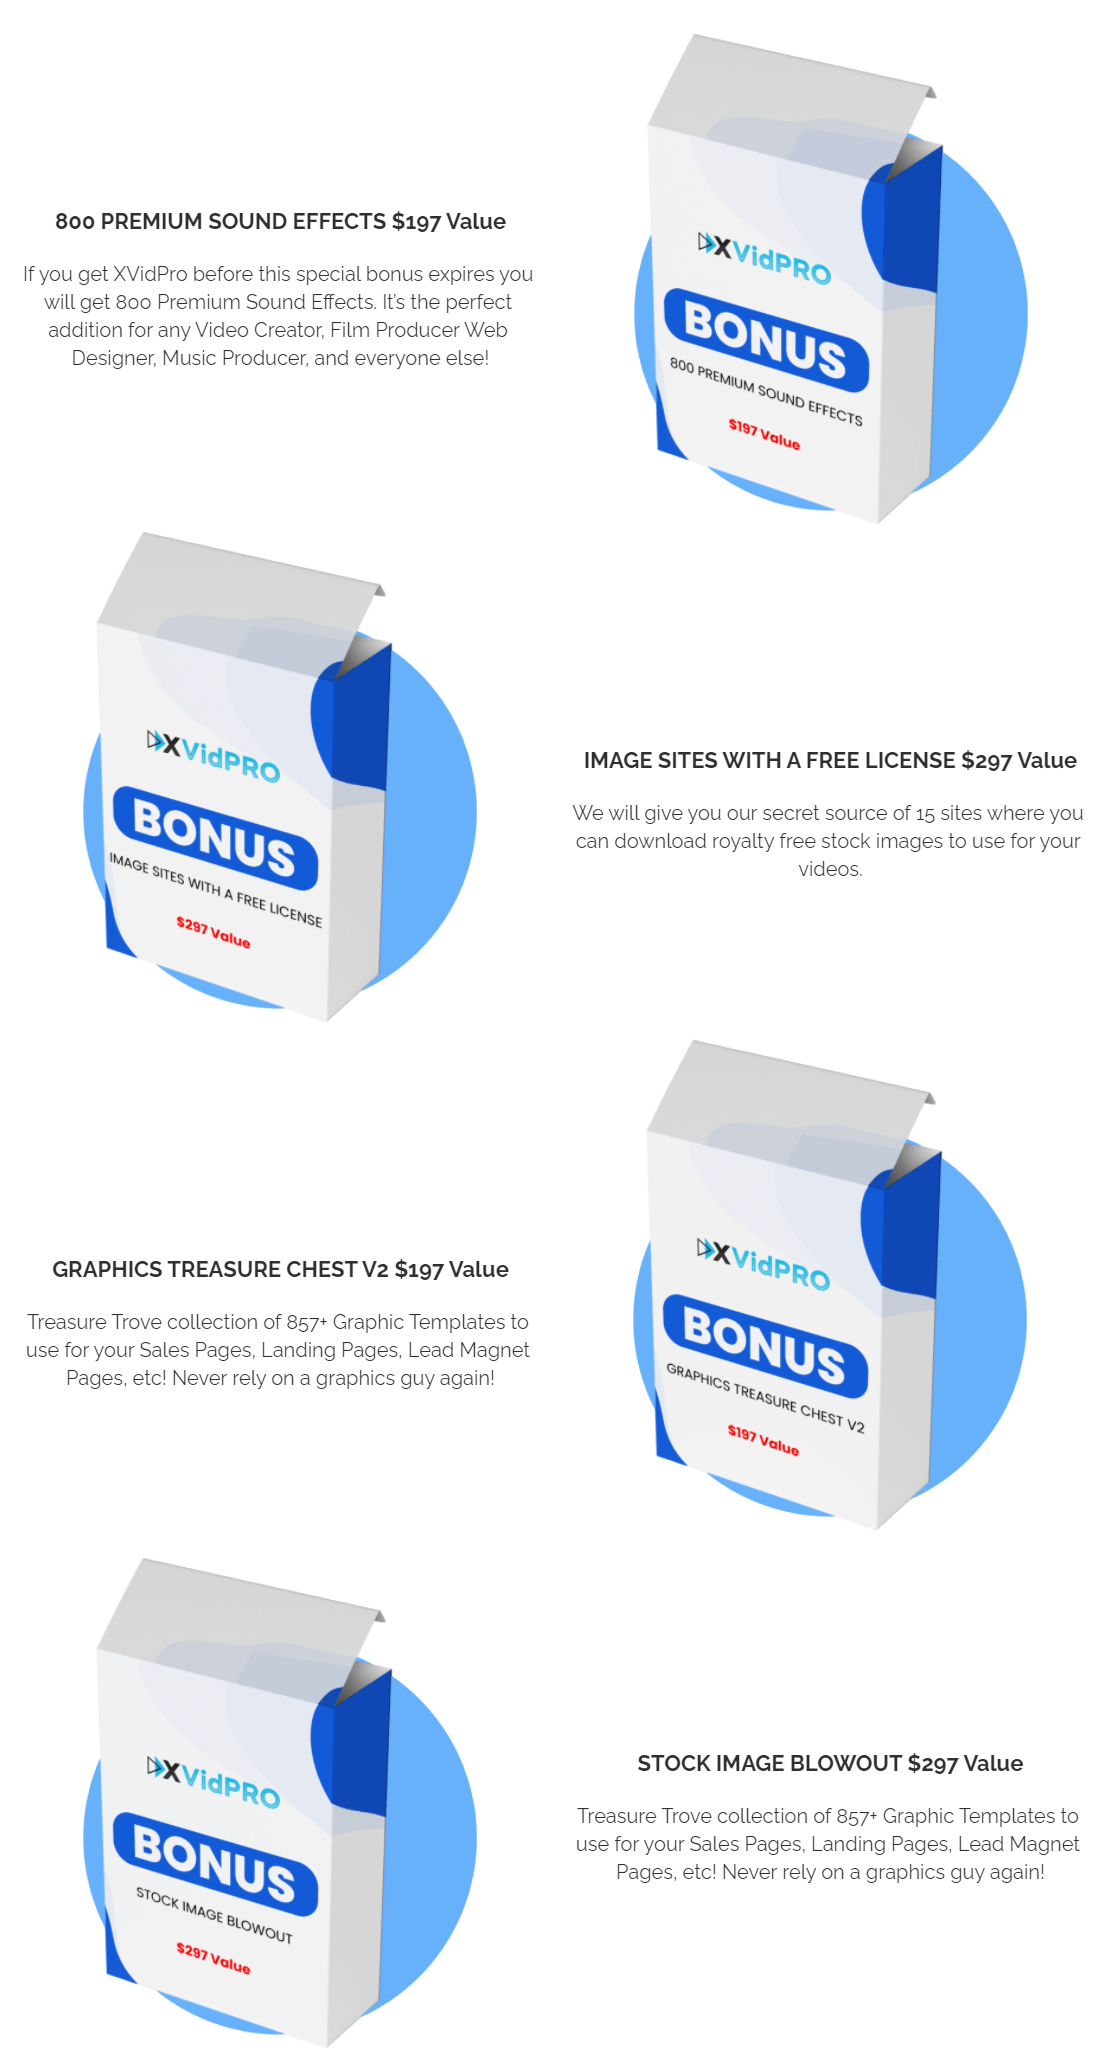 XVidPro-bonus